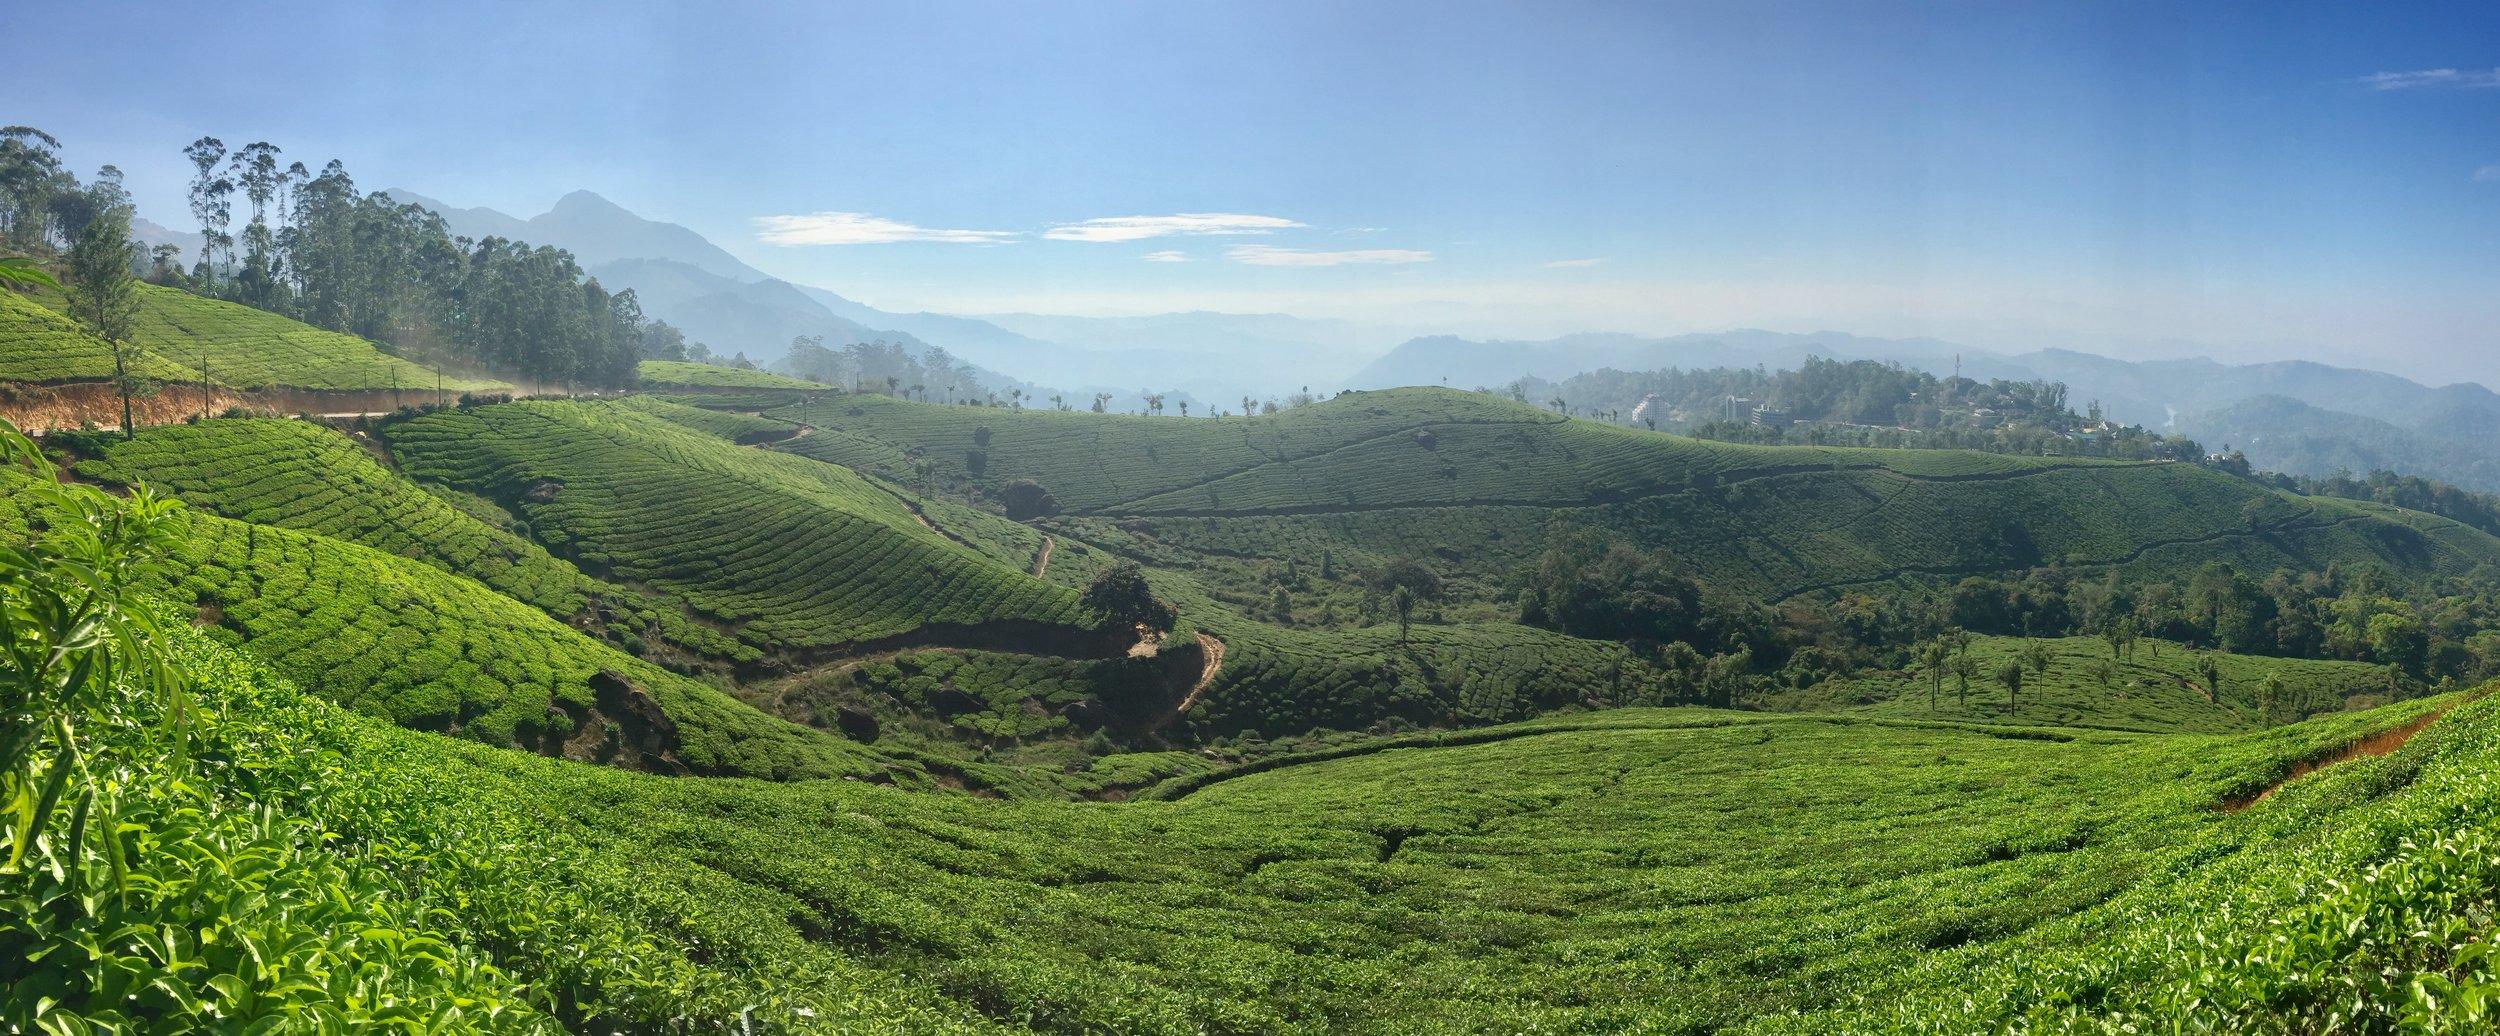 Tea plantations of Munnar, Kerala.